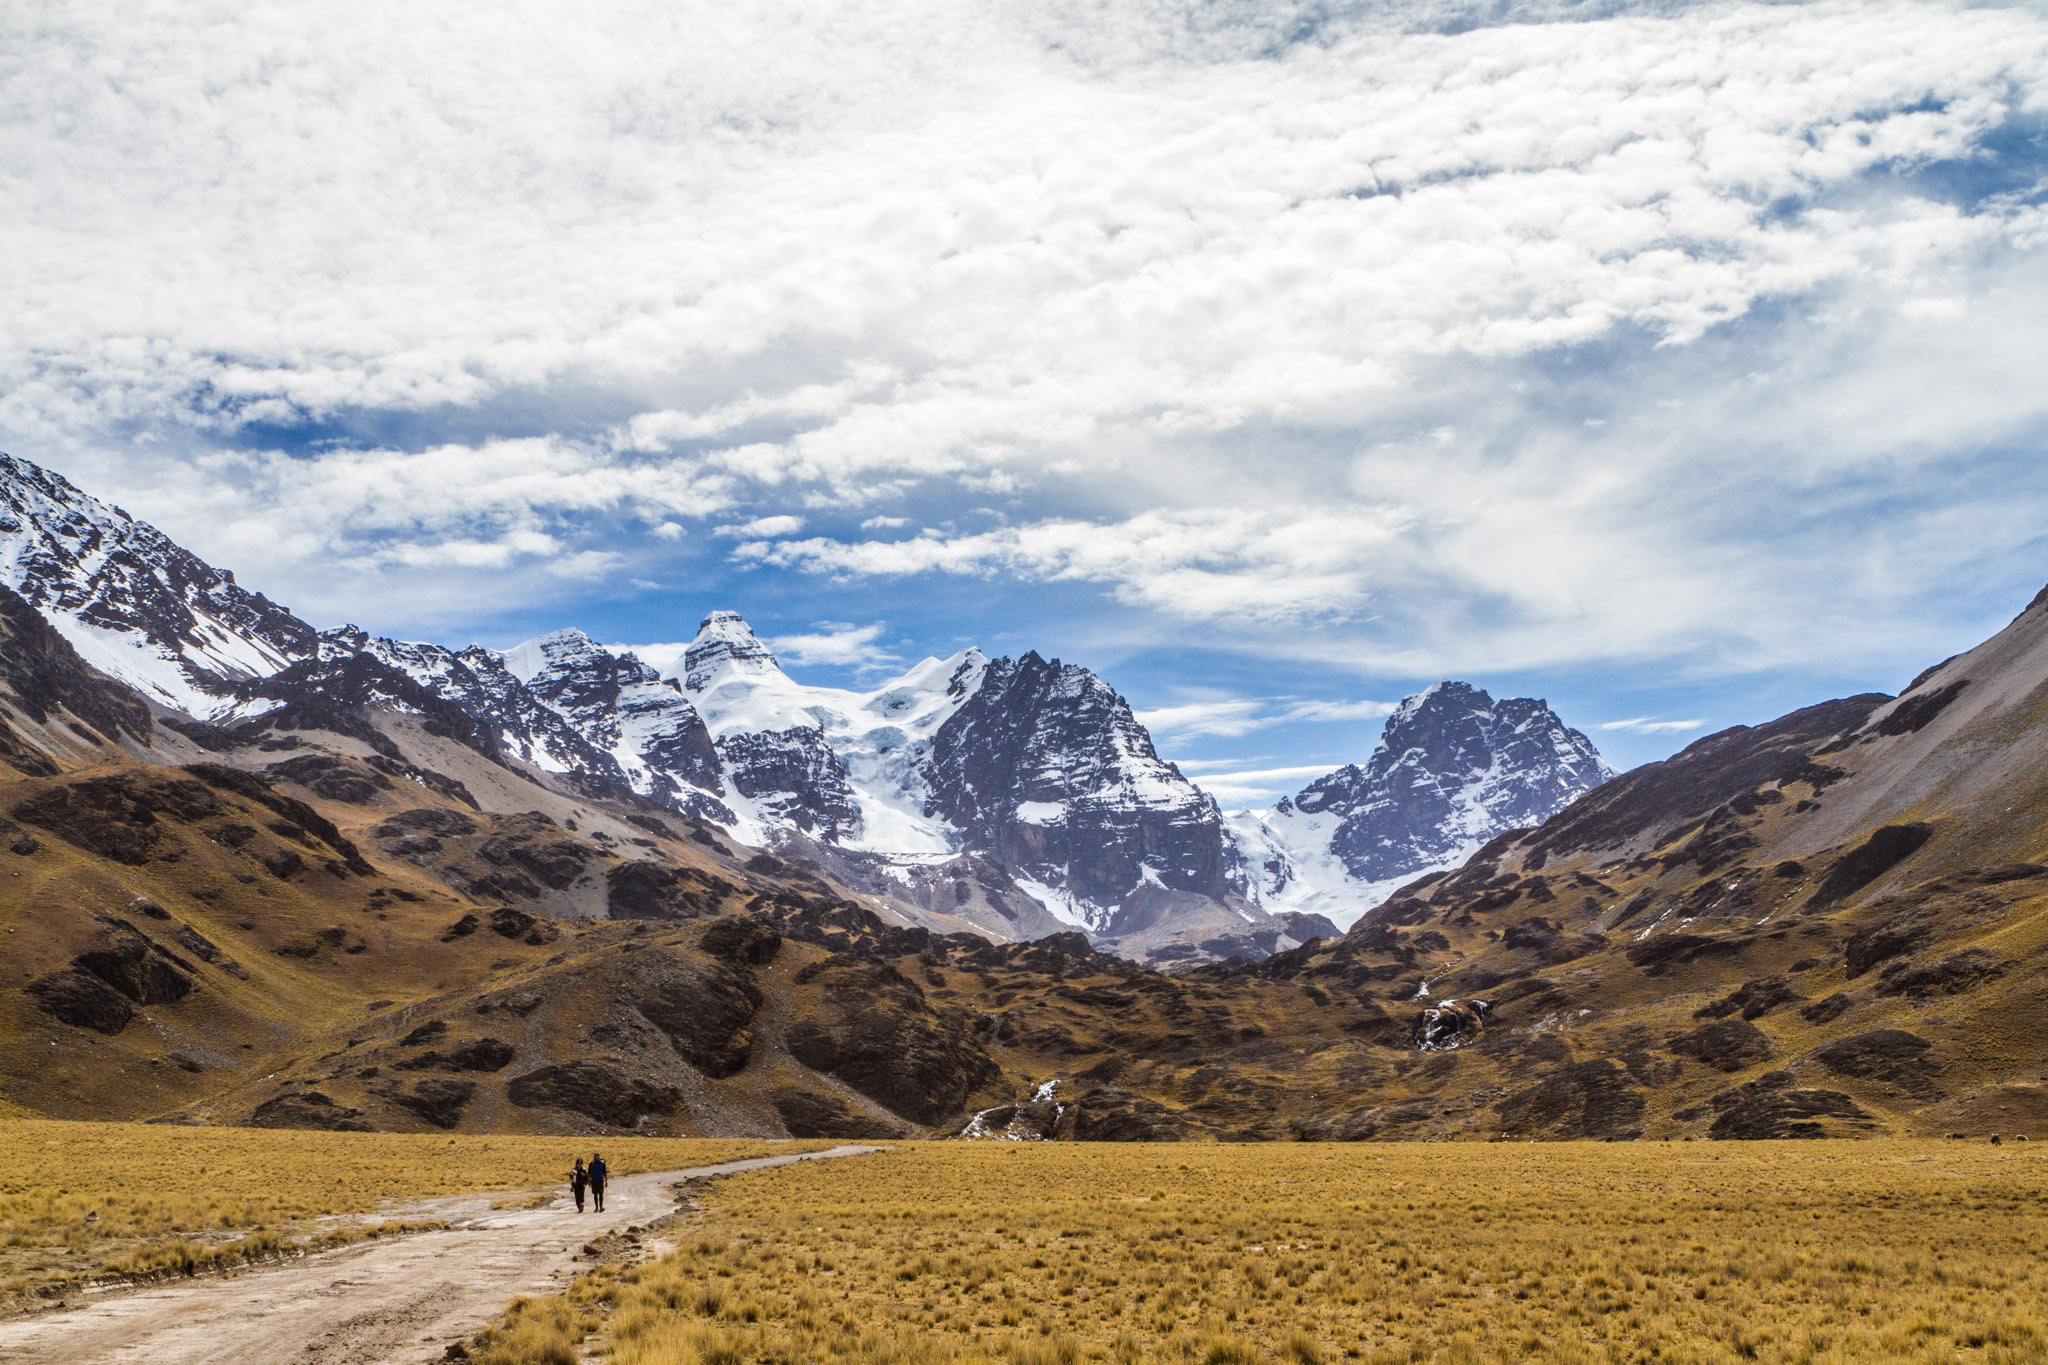 Ali-Barqawi-Studios-Explore-Series-Travel-Adventure-Documentary-C4CGAZA-Bolivia-Mount-Tarija-2015-256.jpg